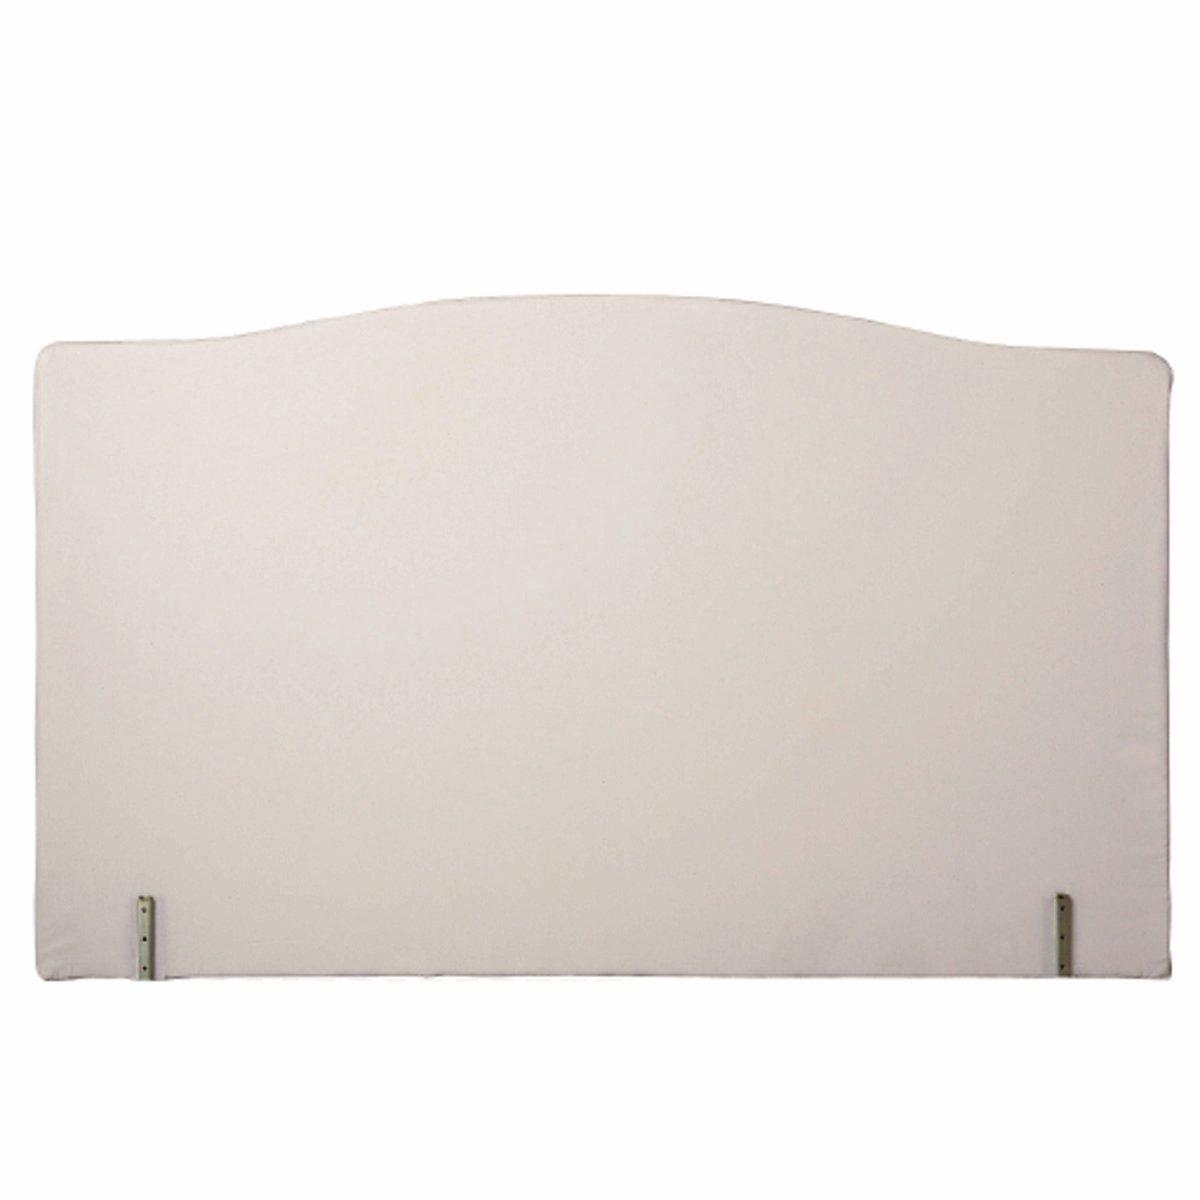 Изголовье LaRedoute Кровати с декоративной обивкой в стиле Людовика XV 140 см белый кровати 140 см